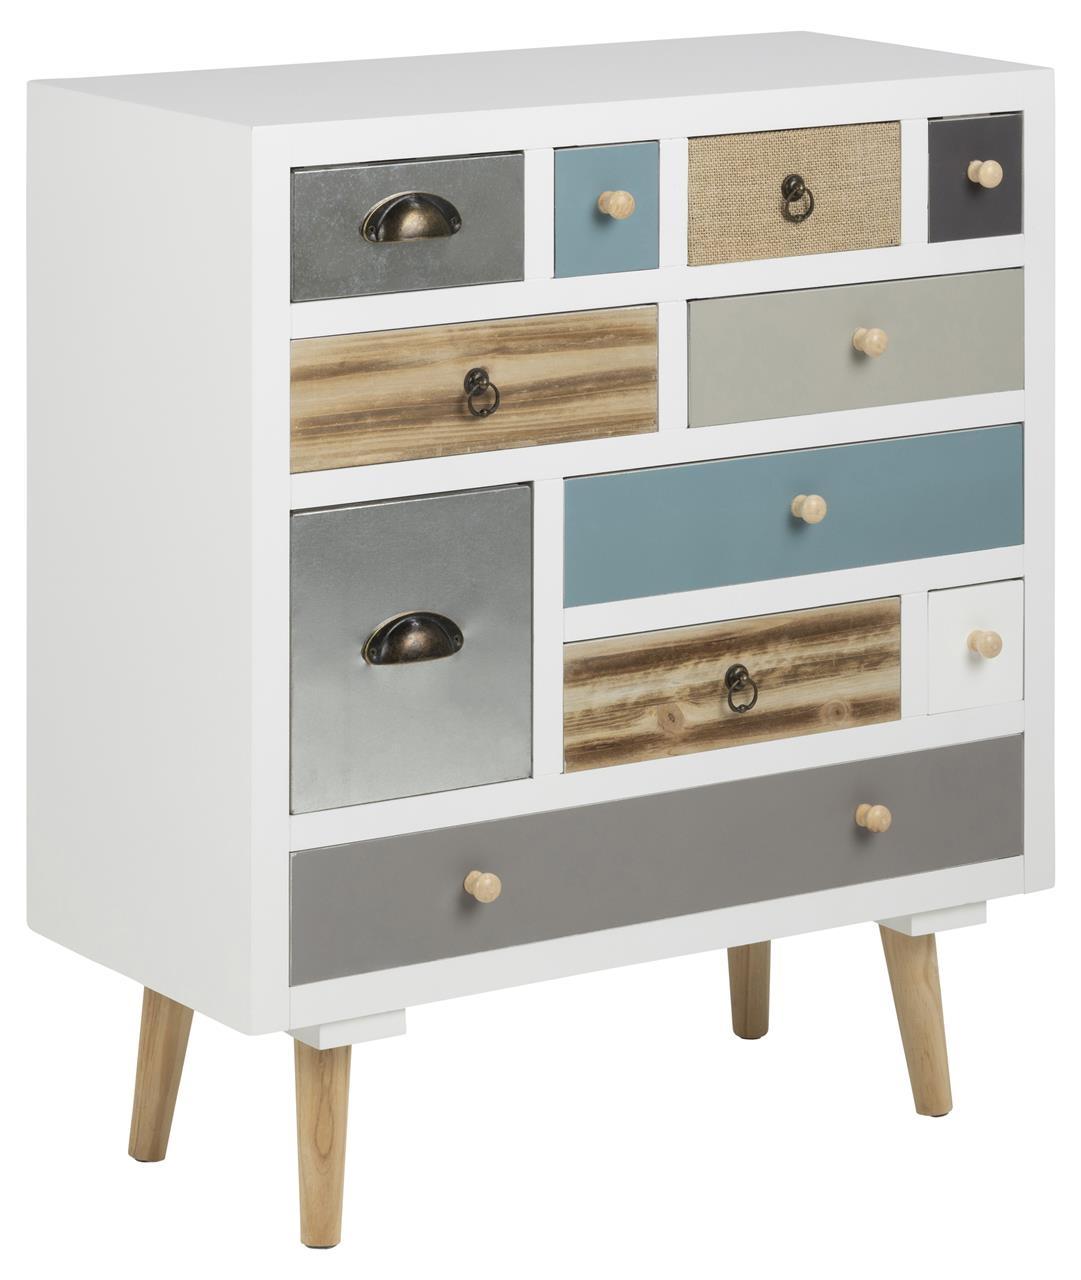 Cabinet din lemn si MDF, cu 11 sertare Thais Multicolor, l70xA32xH81 cm